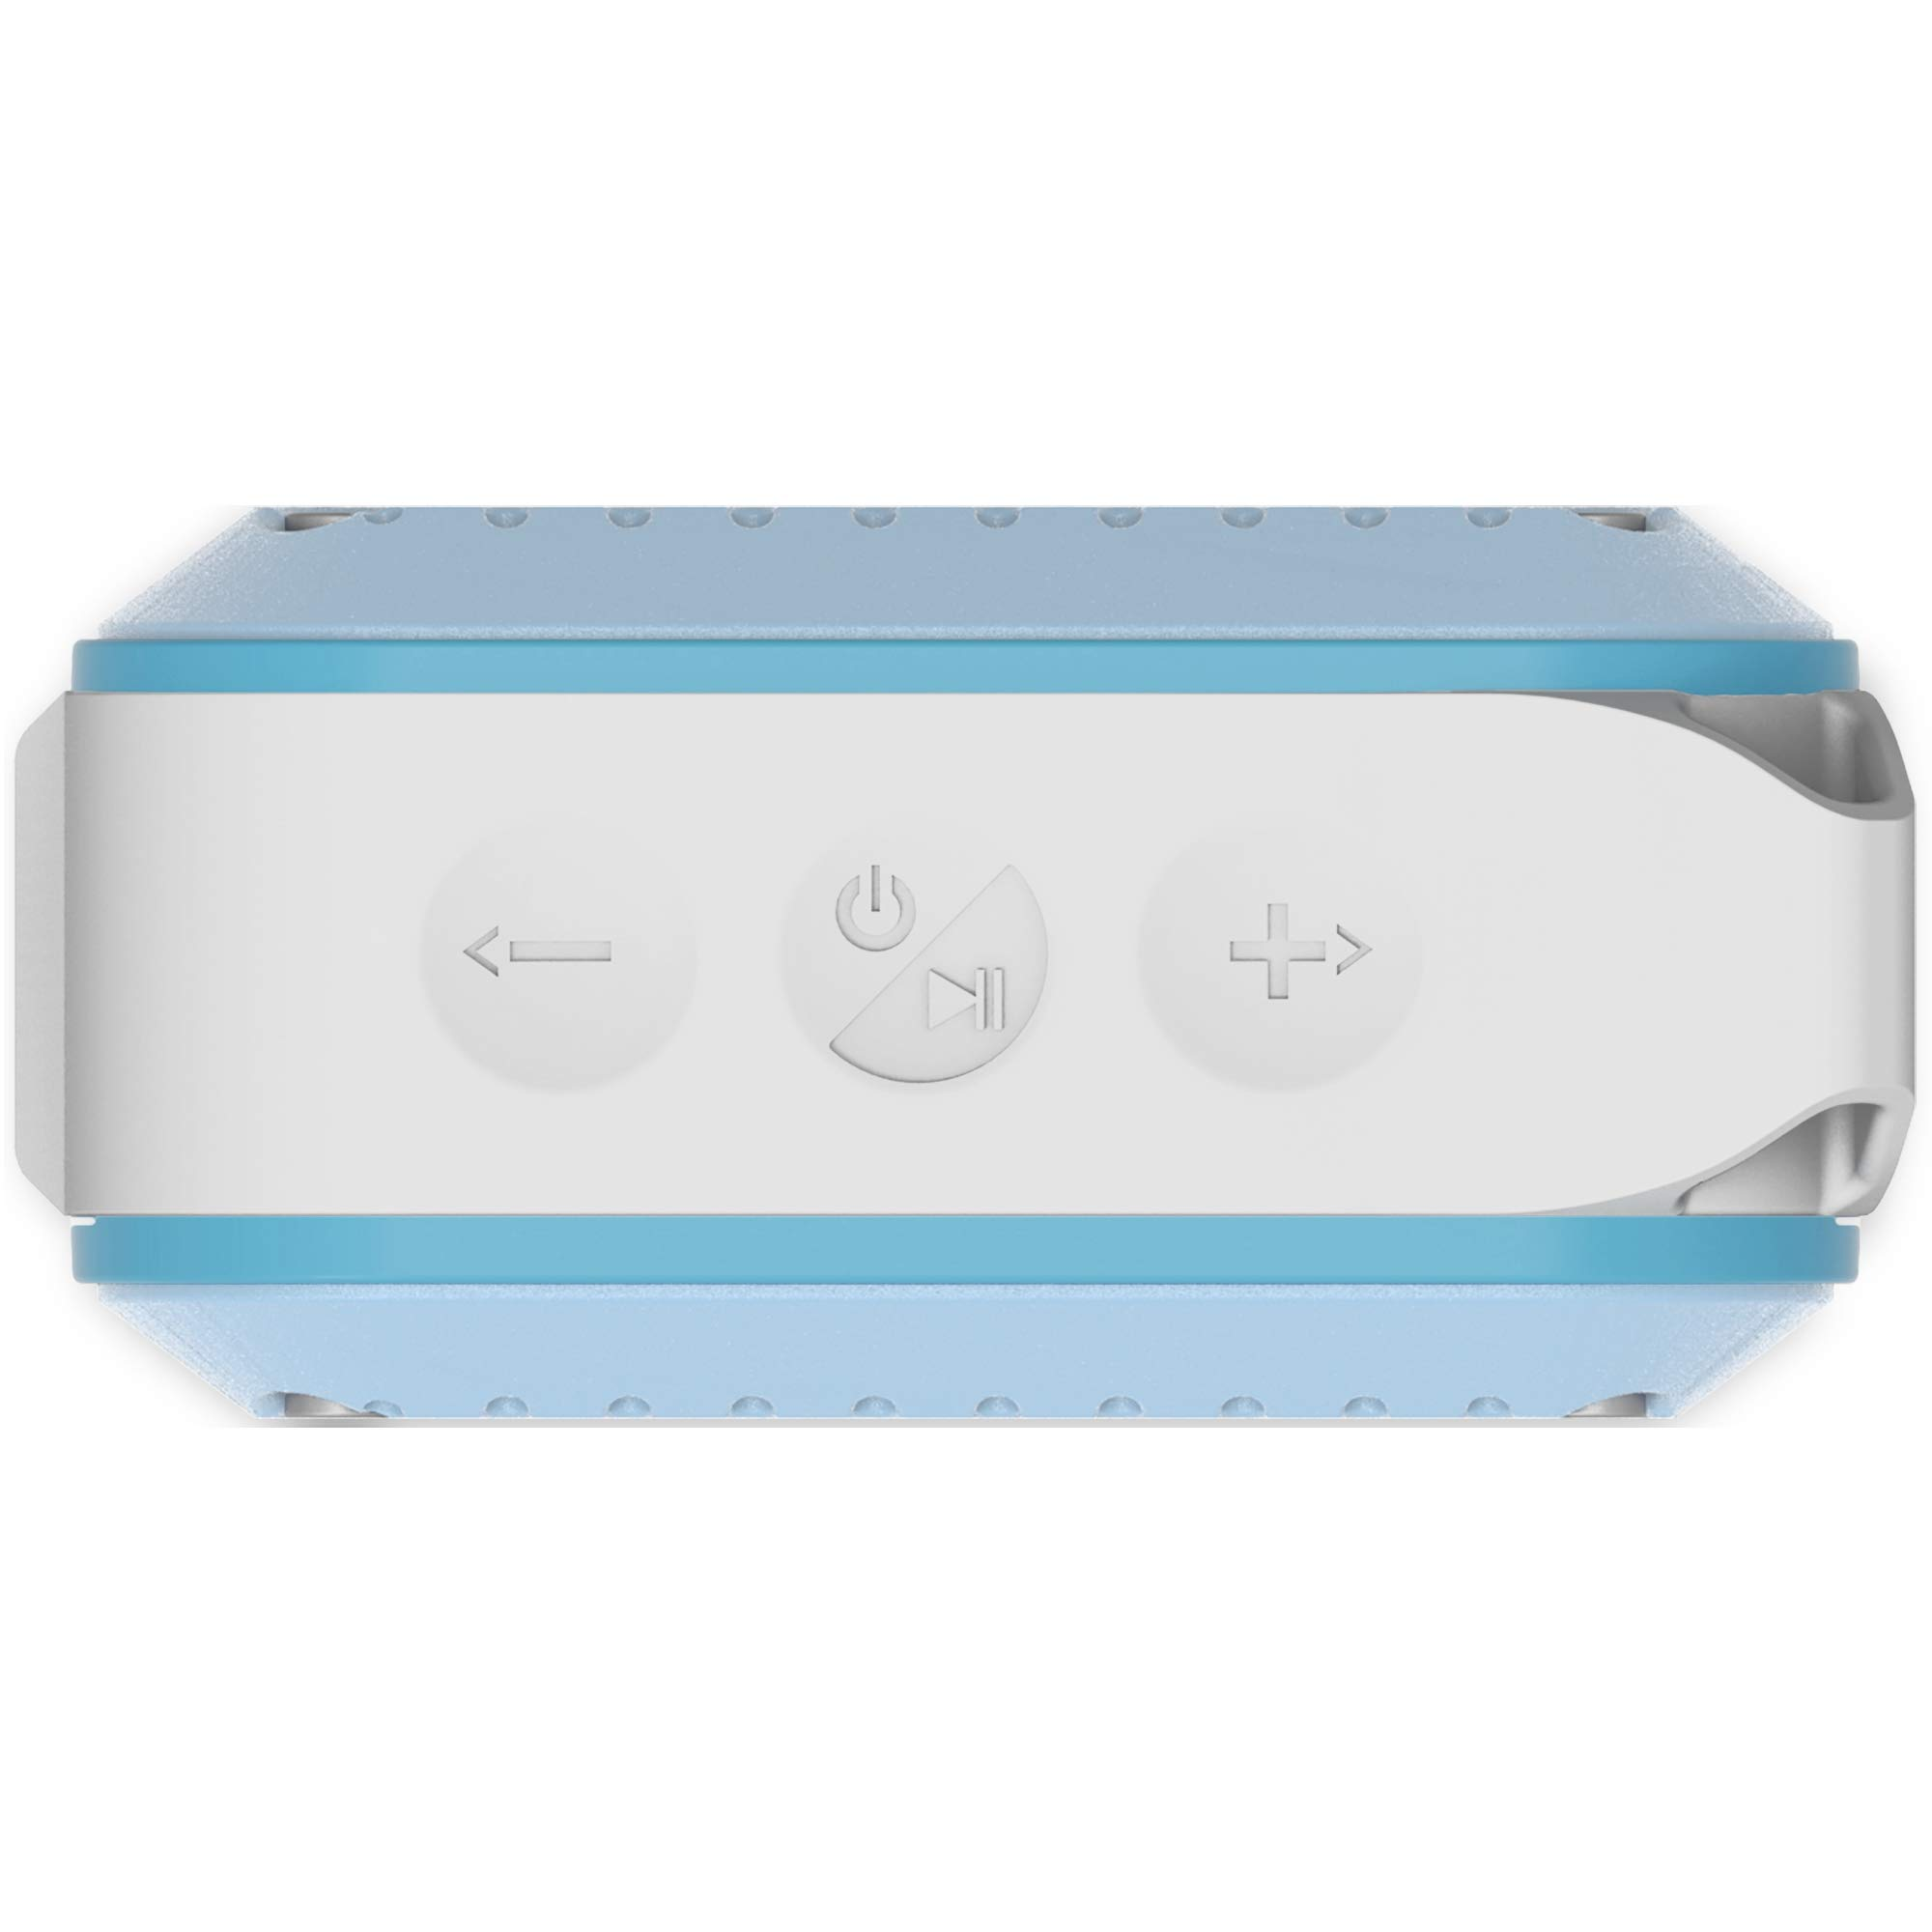 Energy Sistem Outdoor Box Shower Altavoz para la Ducha con Bluetooth TWS, Splash//Shockproof, 5W, microSD MP3, Radio FM